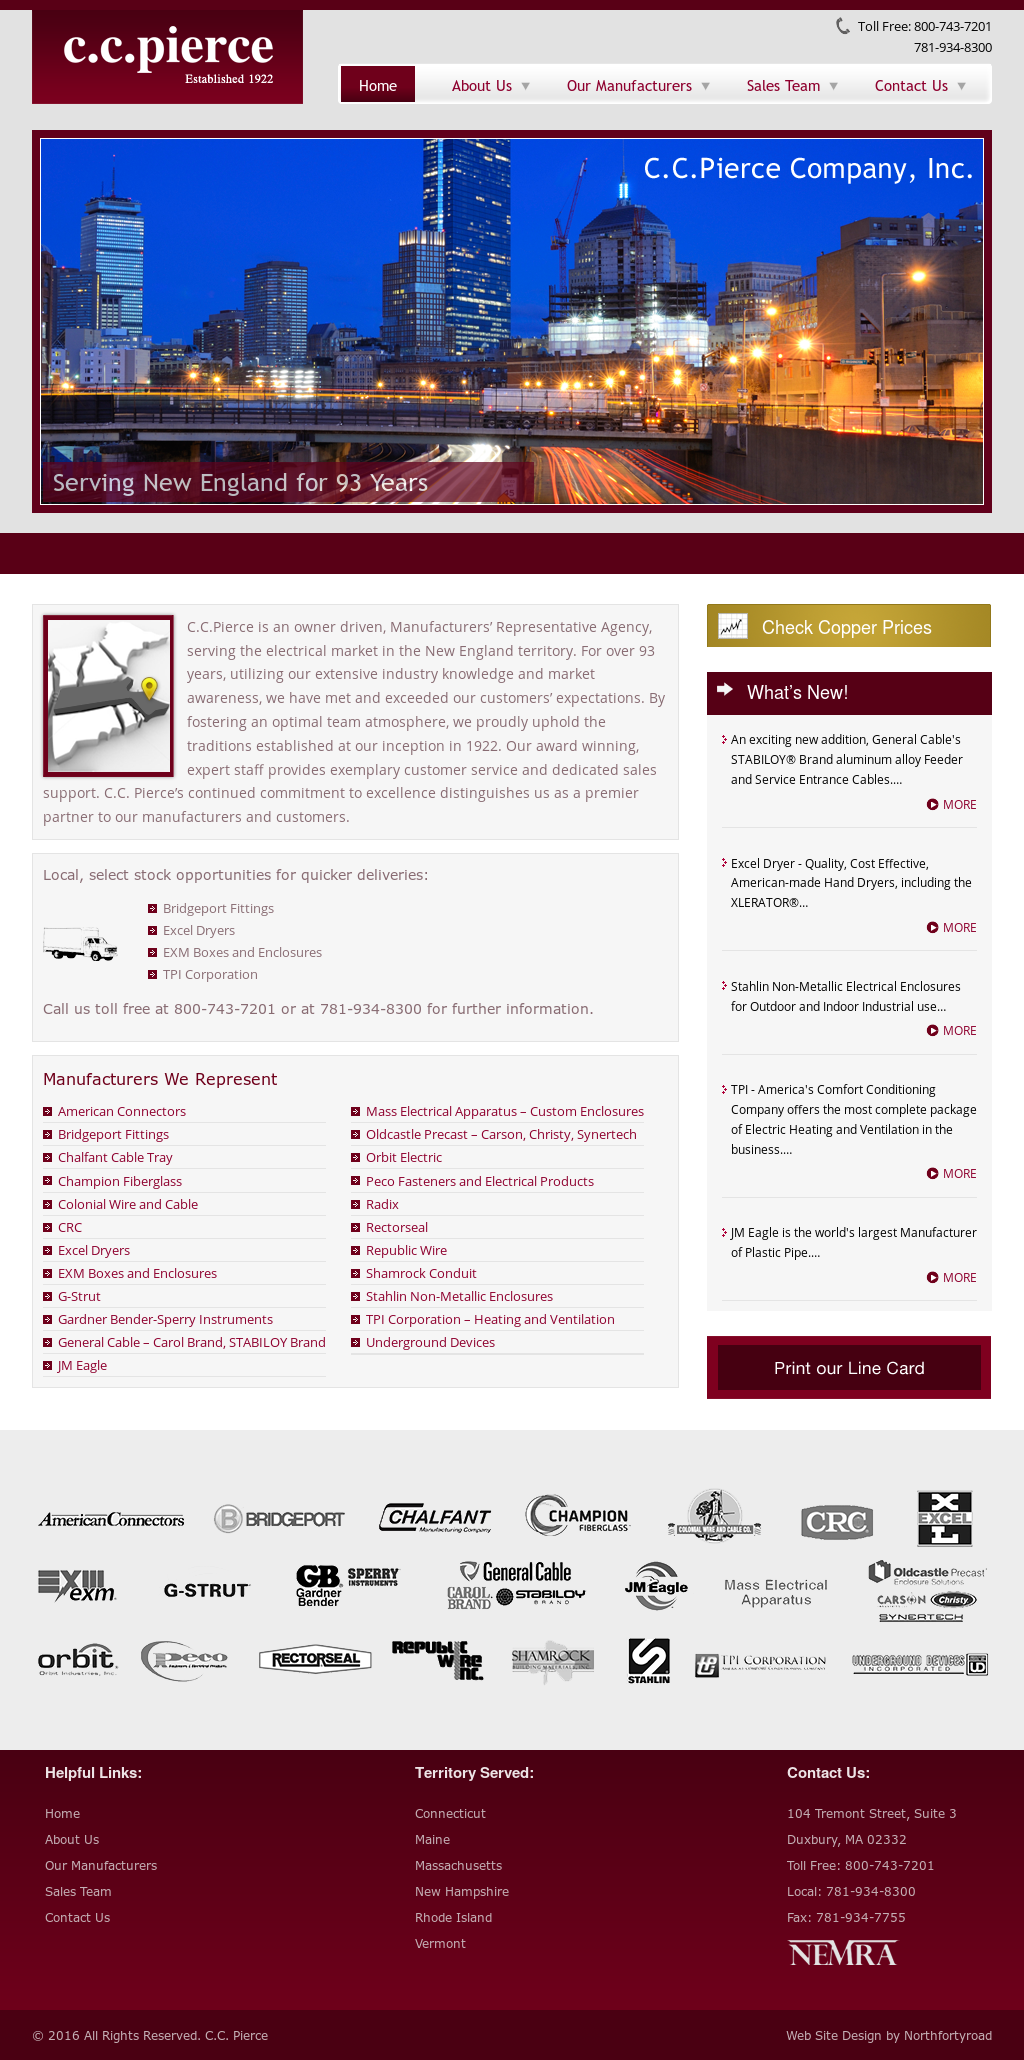 C C pierce Competitors, Revenue and Employees - Owler Company Profile